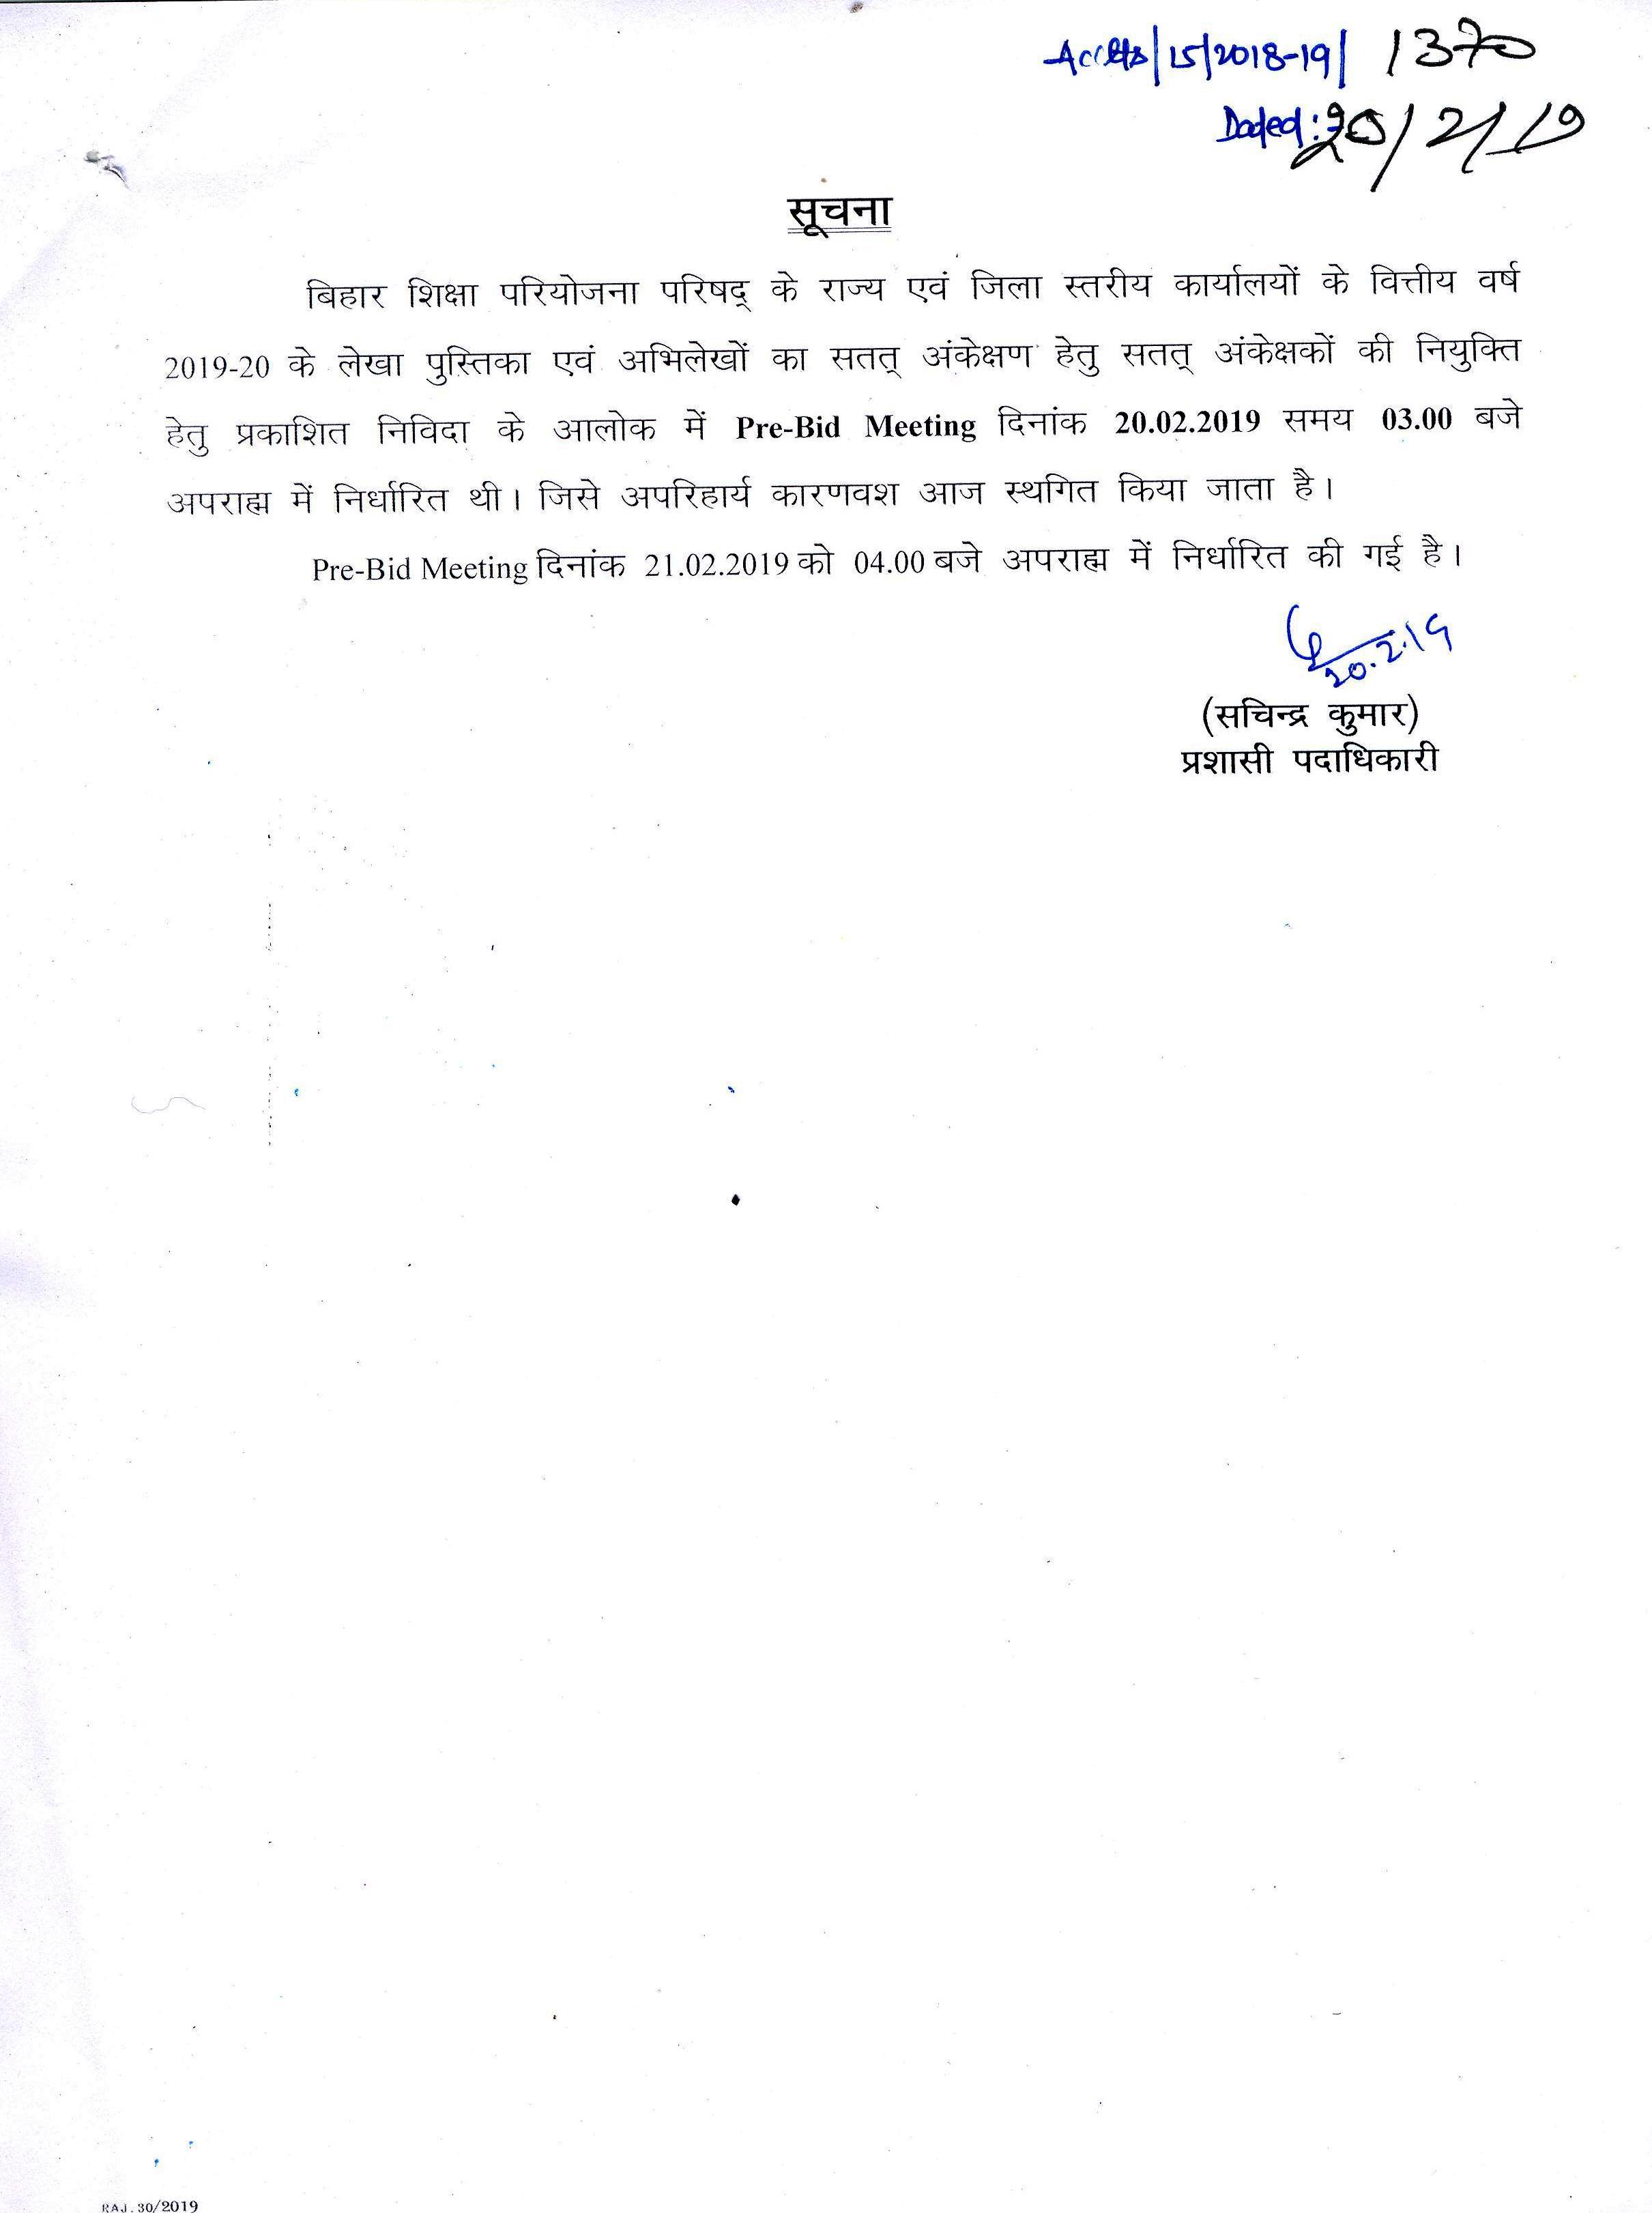 Bihar Education project Council